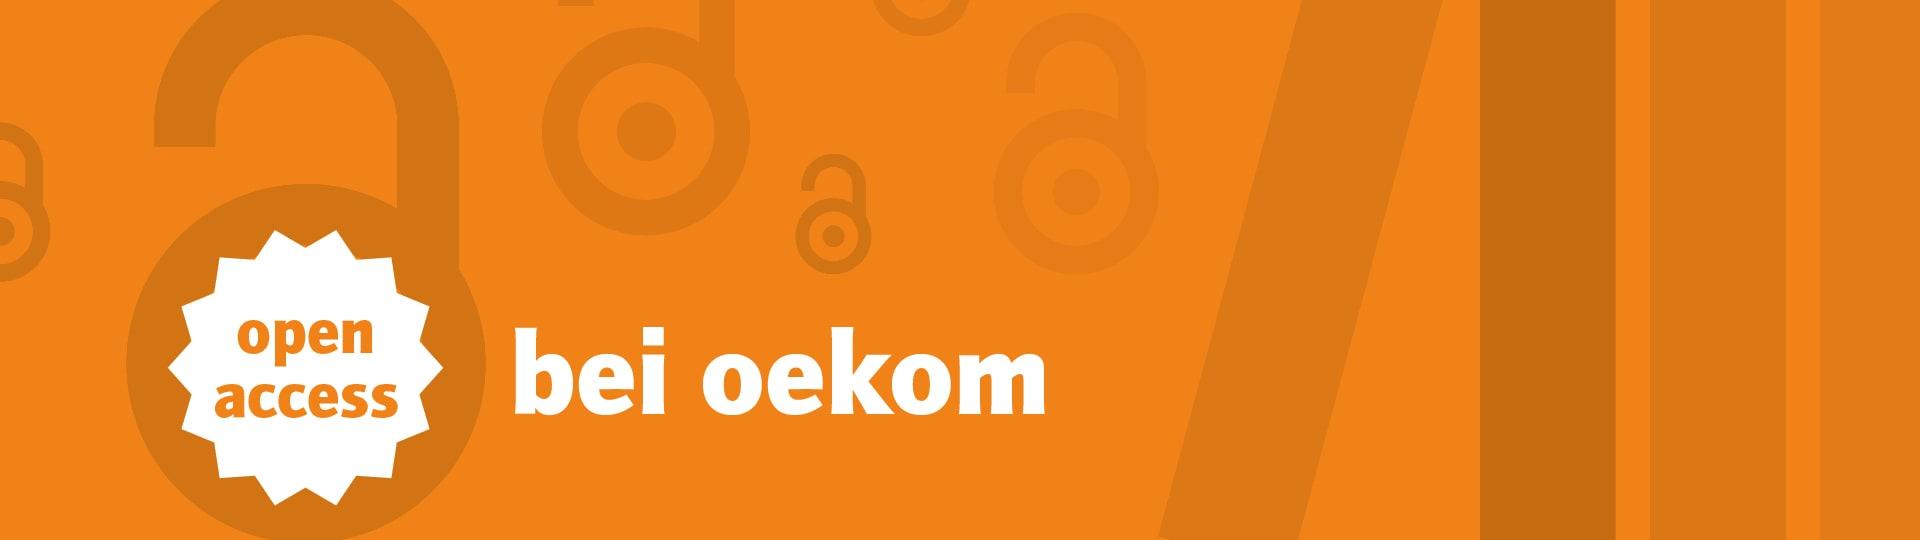 Werbebanner zu Open Access bei oekom